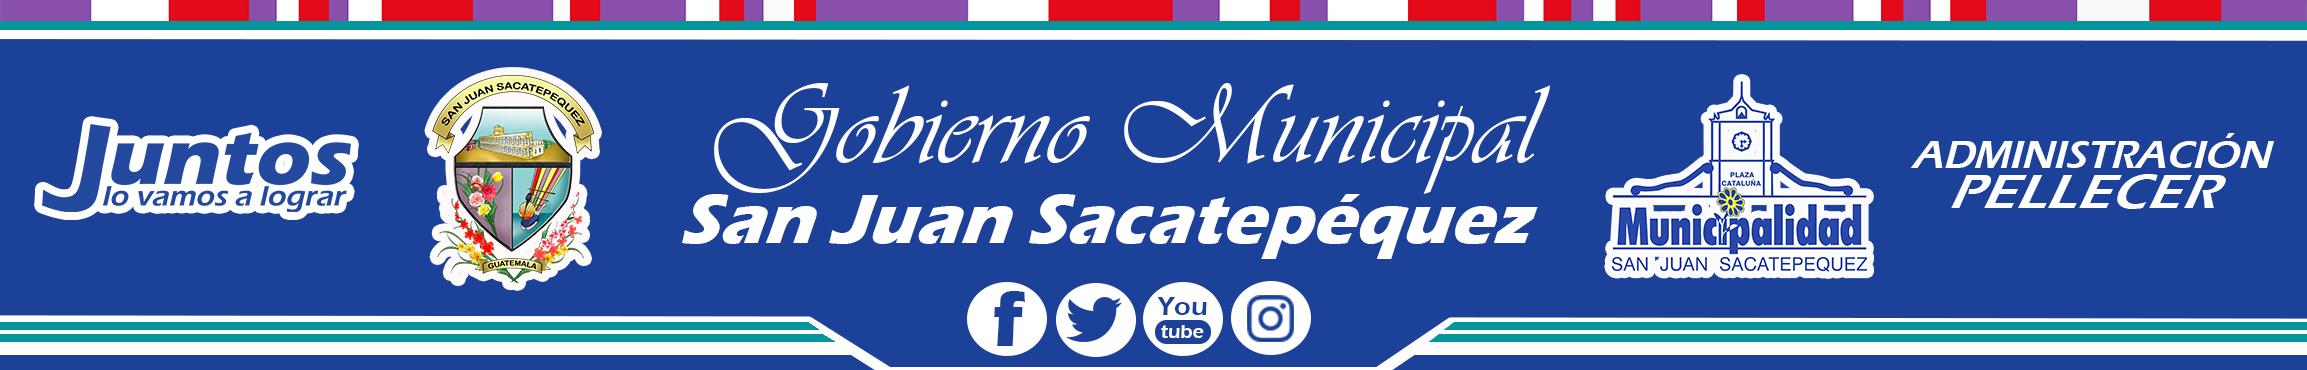 "Municipalidad de San Juan Sacatepéquez, 7a. Calle ""A"" y 6a. Ave. Zona 1, Plaza Cataluña San Juan Sacatepequez, Guatemala. C.A.      PBX: 7962-5151"